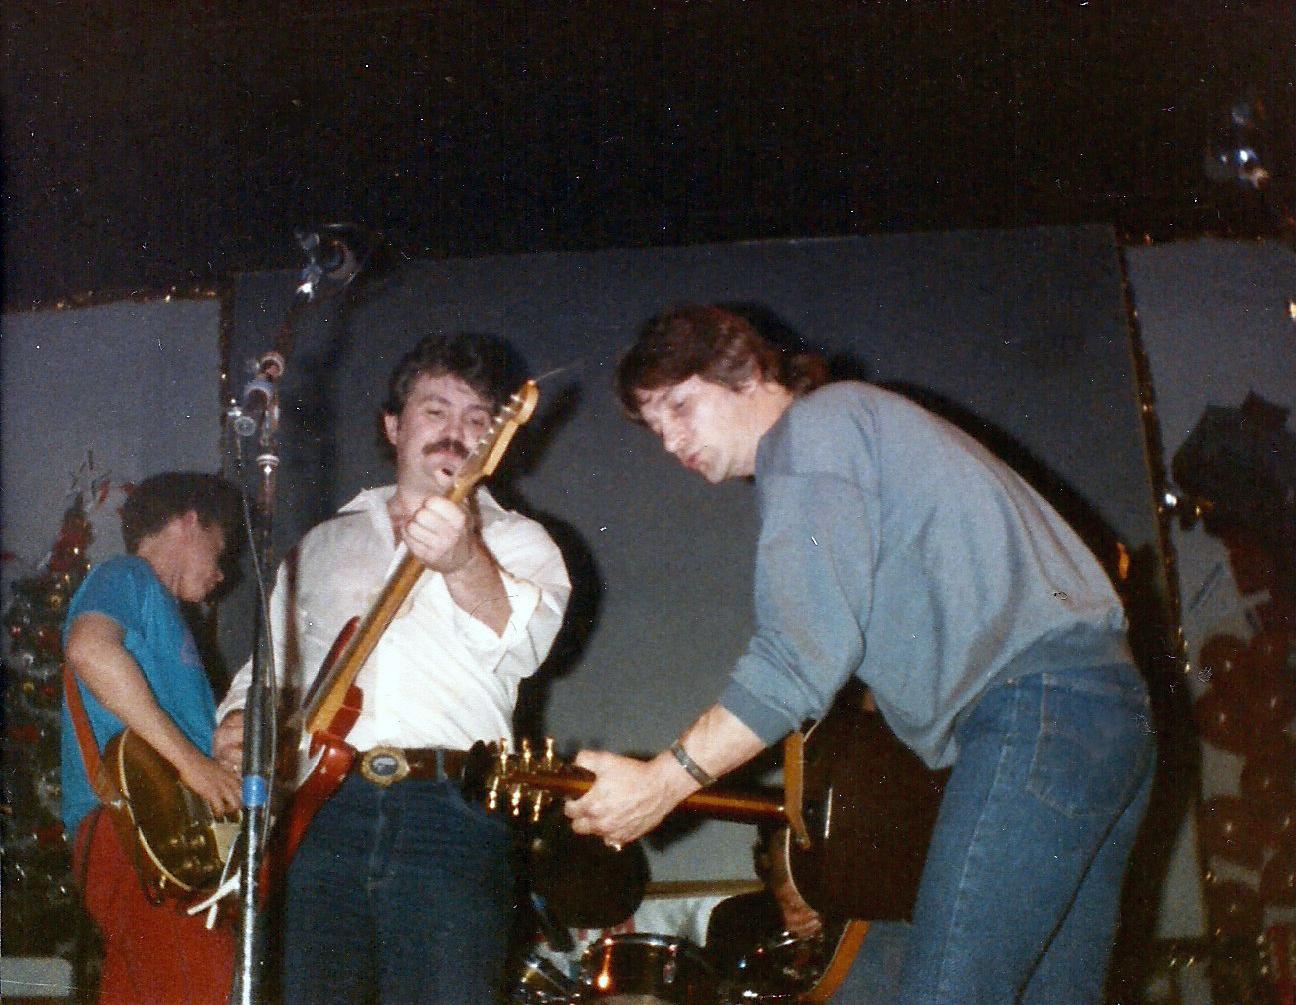 Gene Clark and Rick Roberts